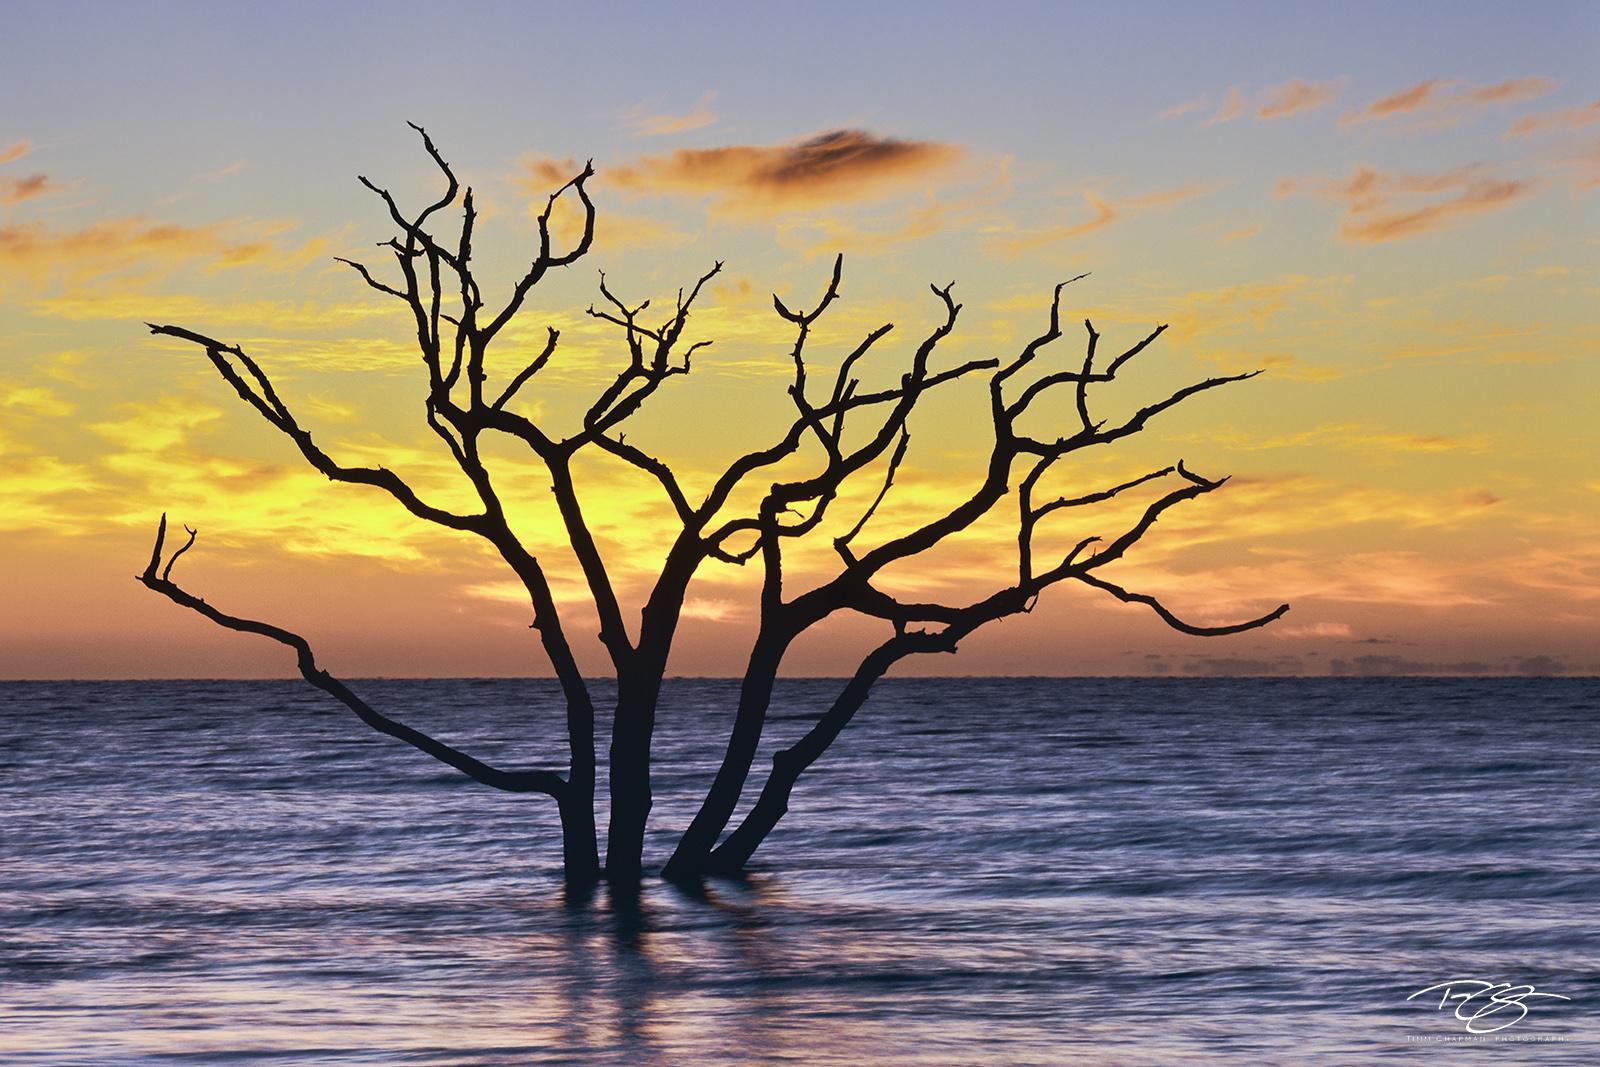 South Carolina, boneyard, skeleton, tree, botany bay, edisto island, dead tree, sea of tranquility, water, coast, surf, ocean, daybreak, firey, fire, sunrise, peace, peaceful, calming, zen, yoga, silh, photo